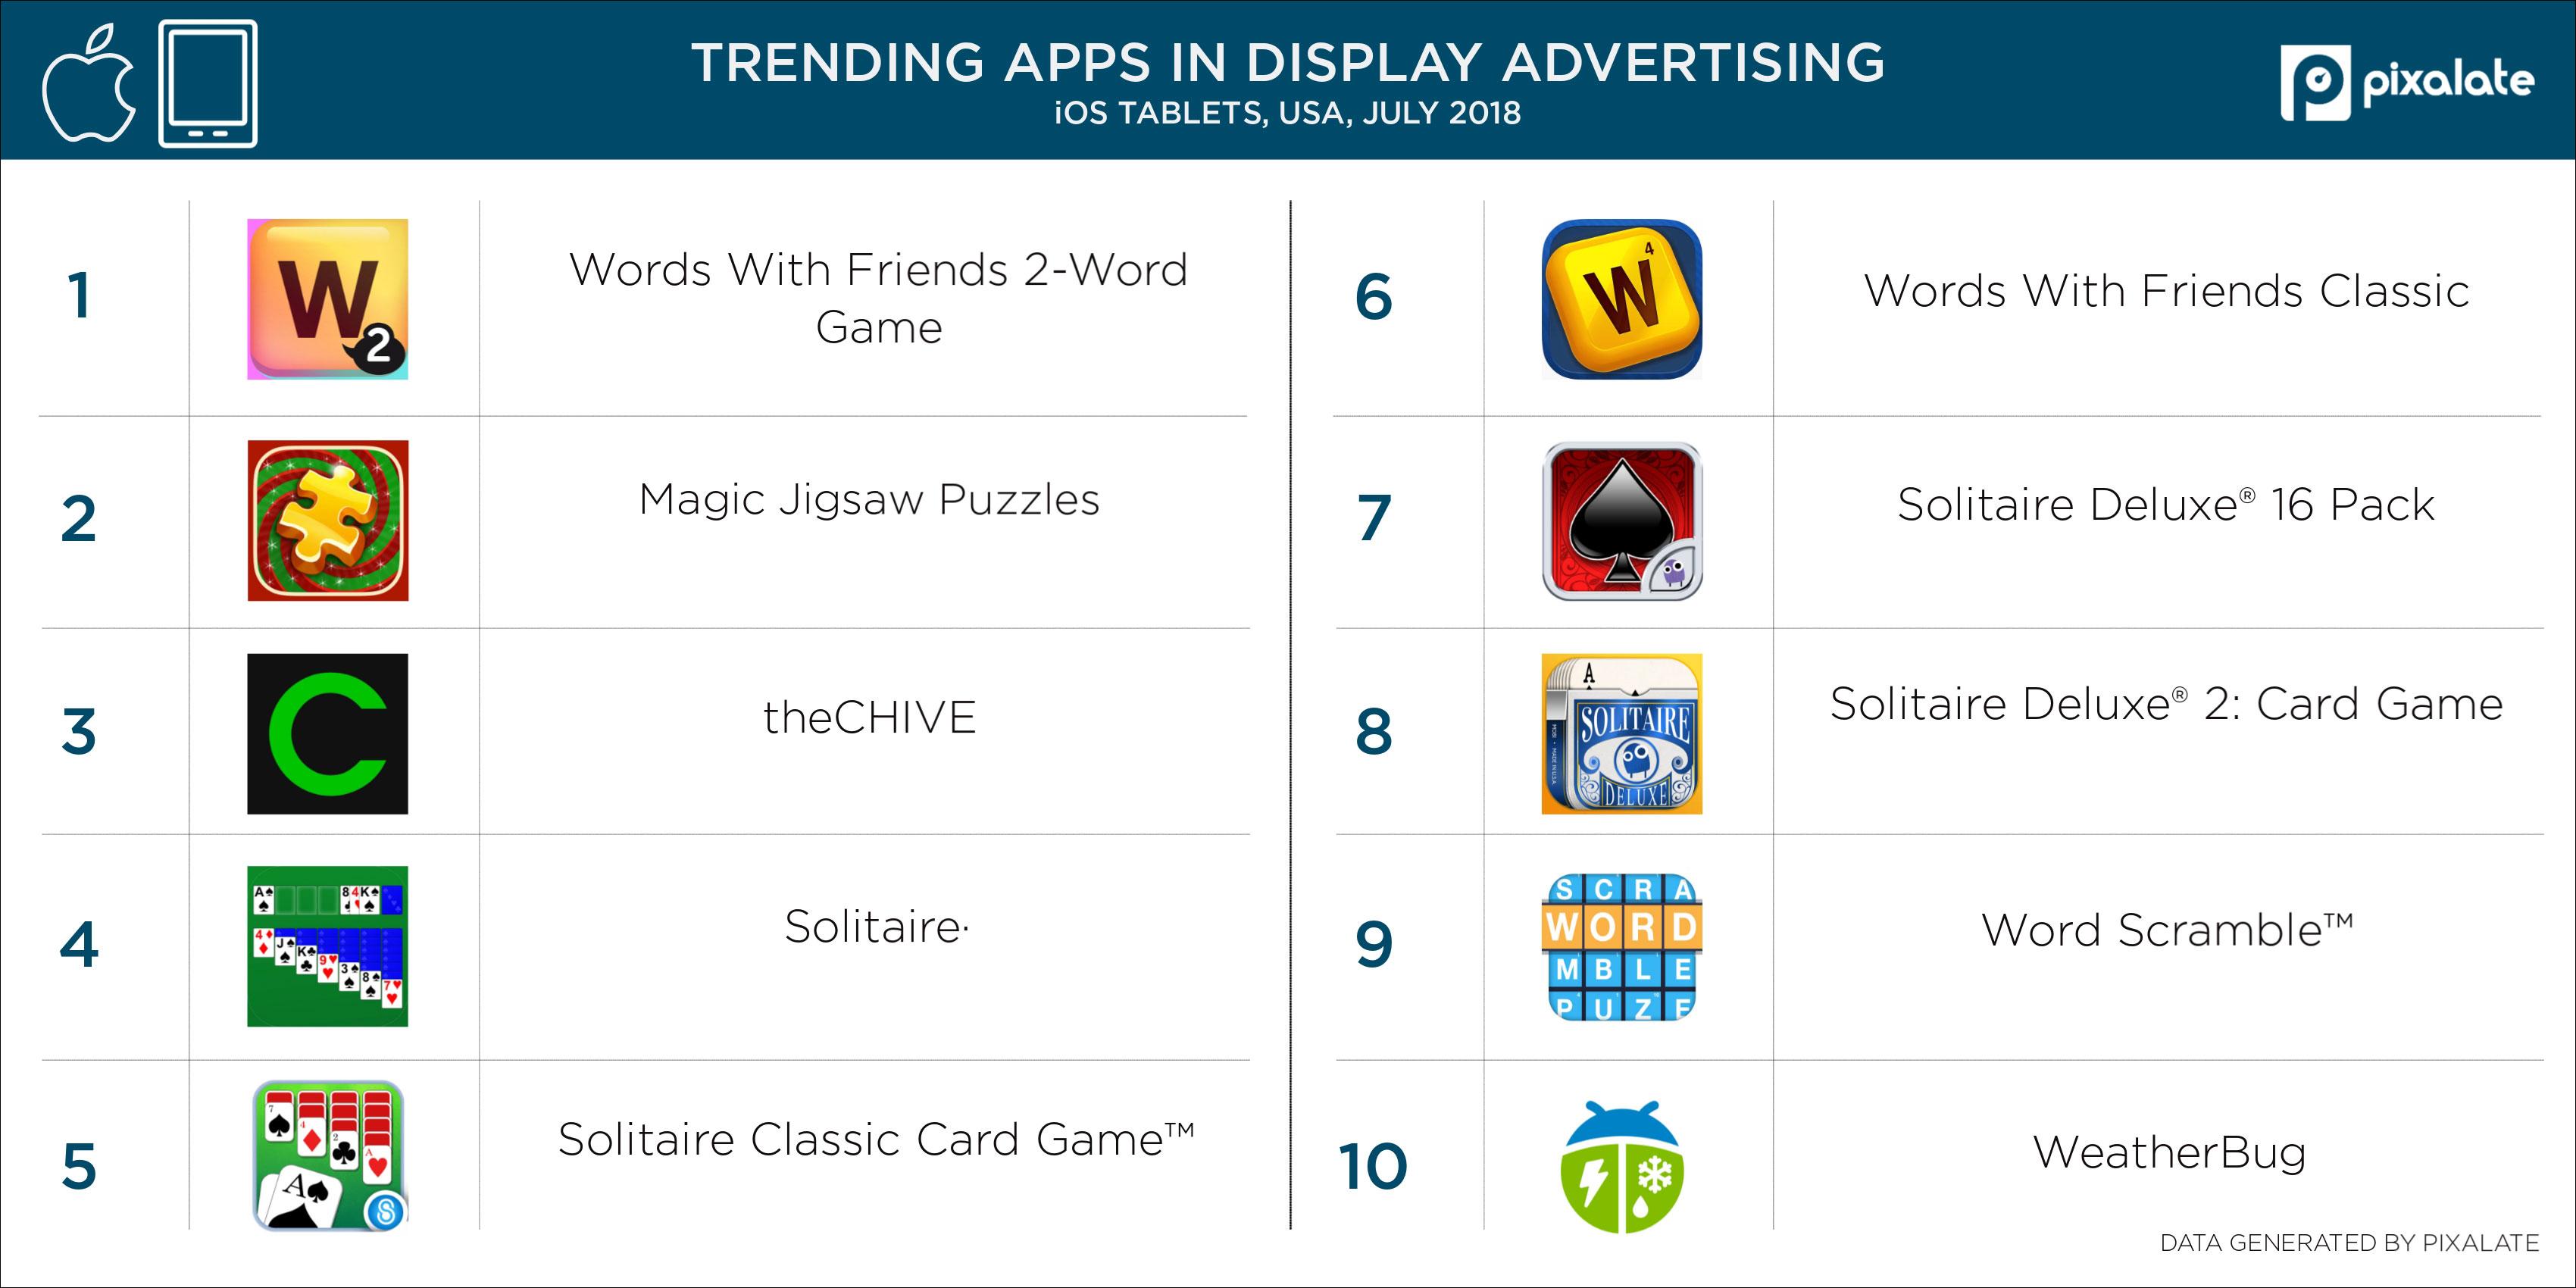 Display-iPad-tablet-top-apps-USA-(July-2018-data)-(1)